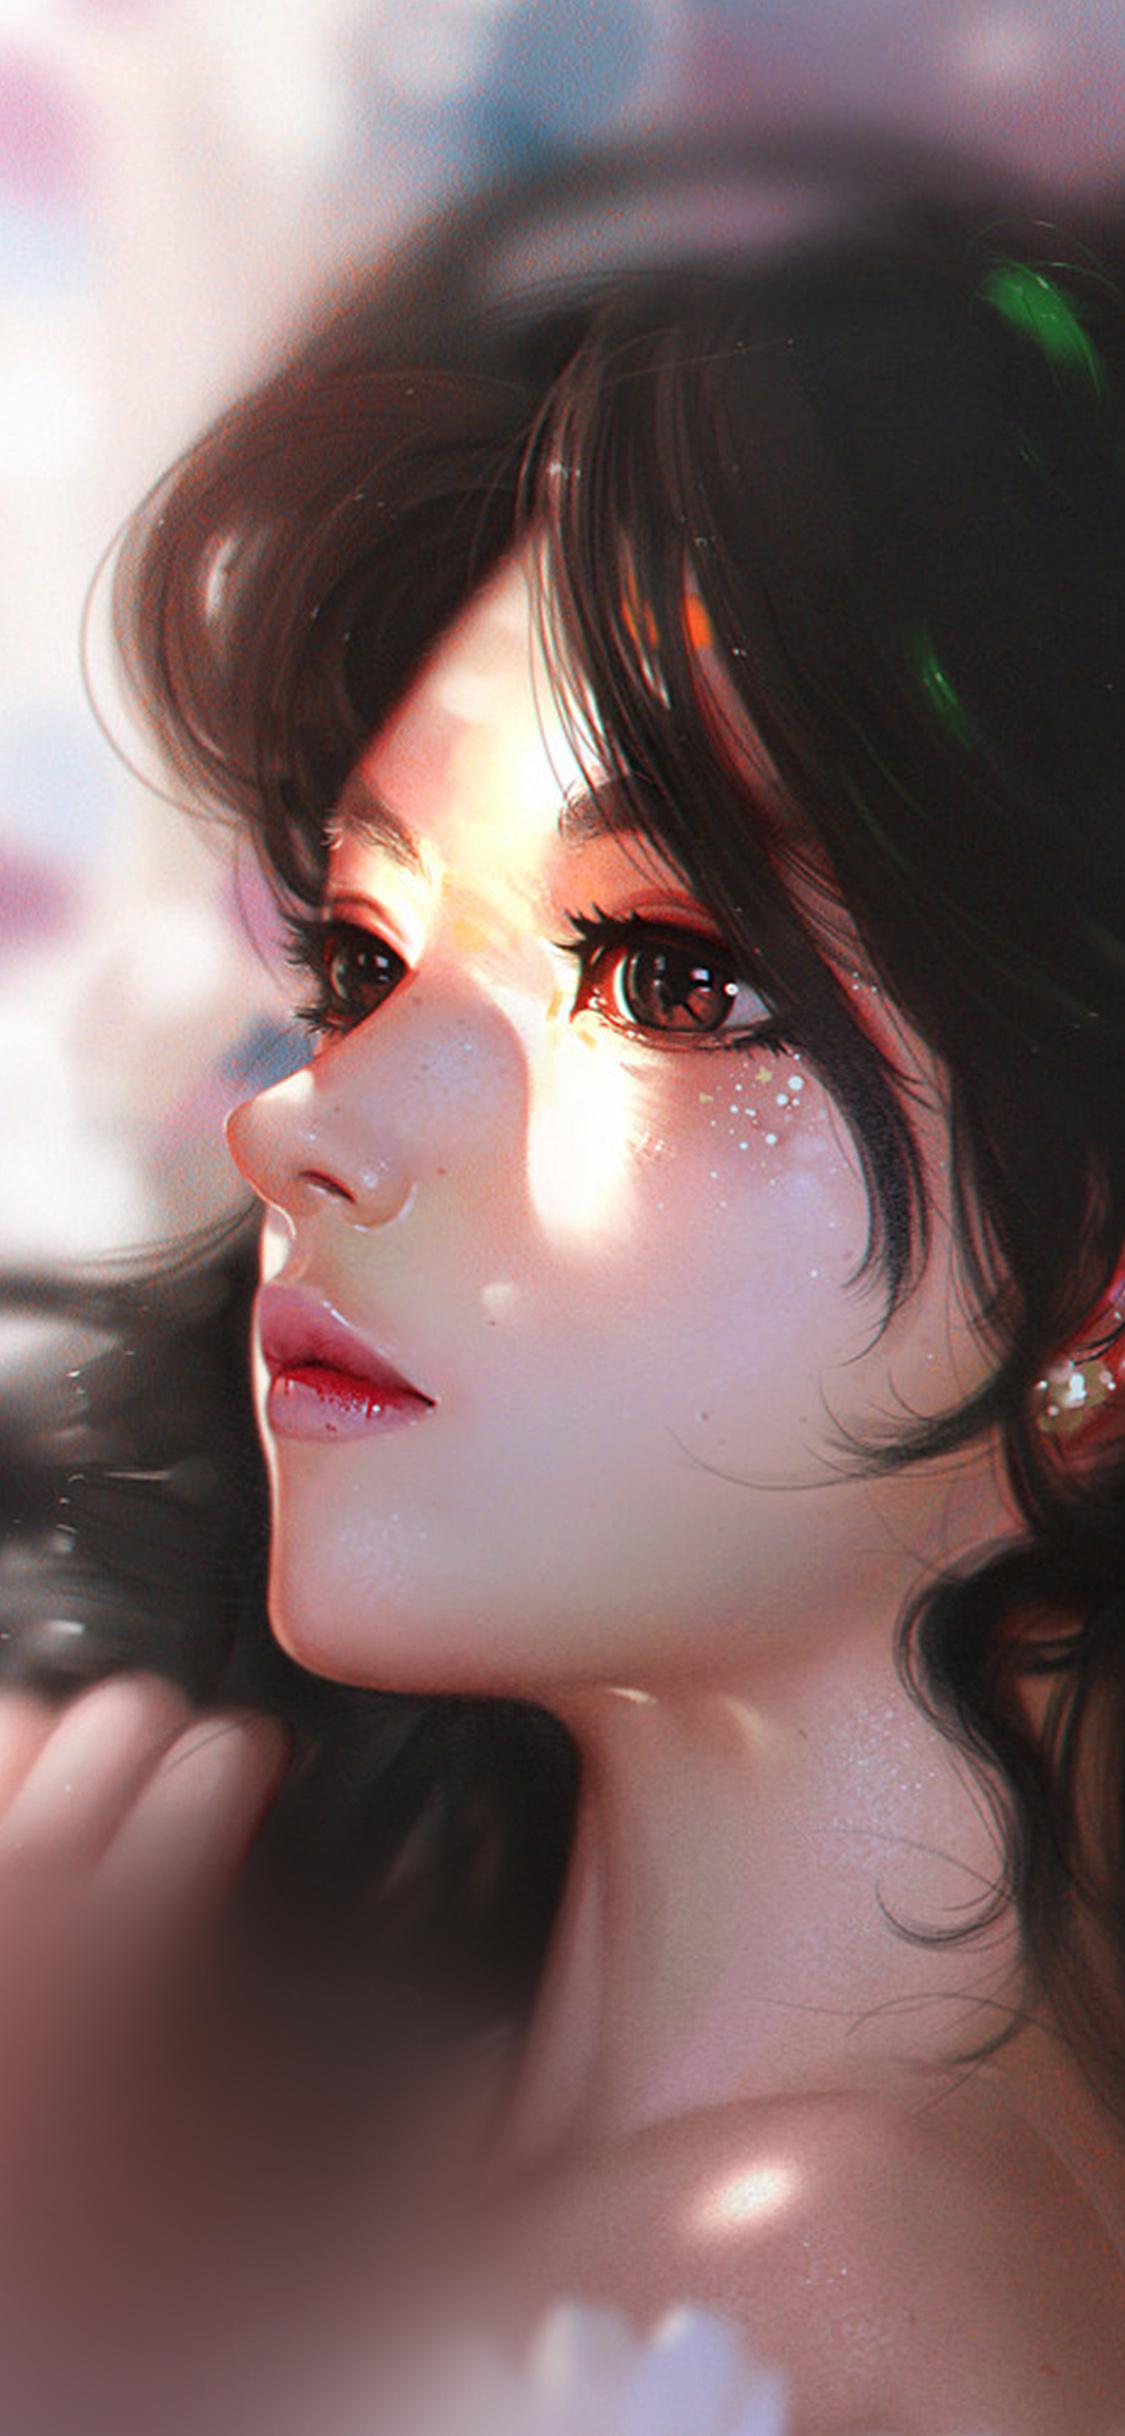 iPhoneXpapers.com-Apple-iPhone-wallpaper-au92-liang-xing-daisy-cute-girl-illustration-art